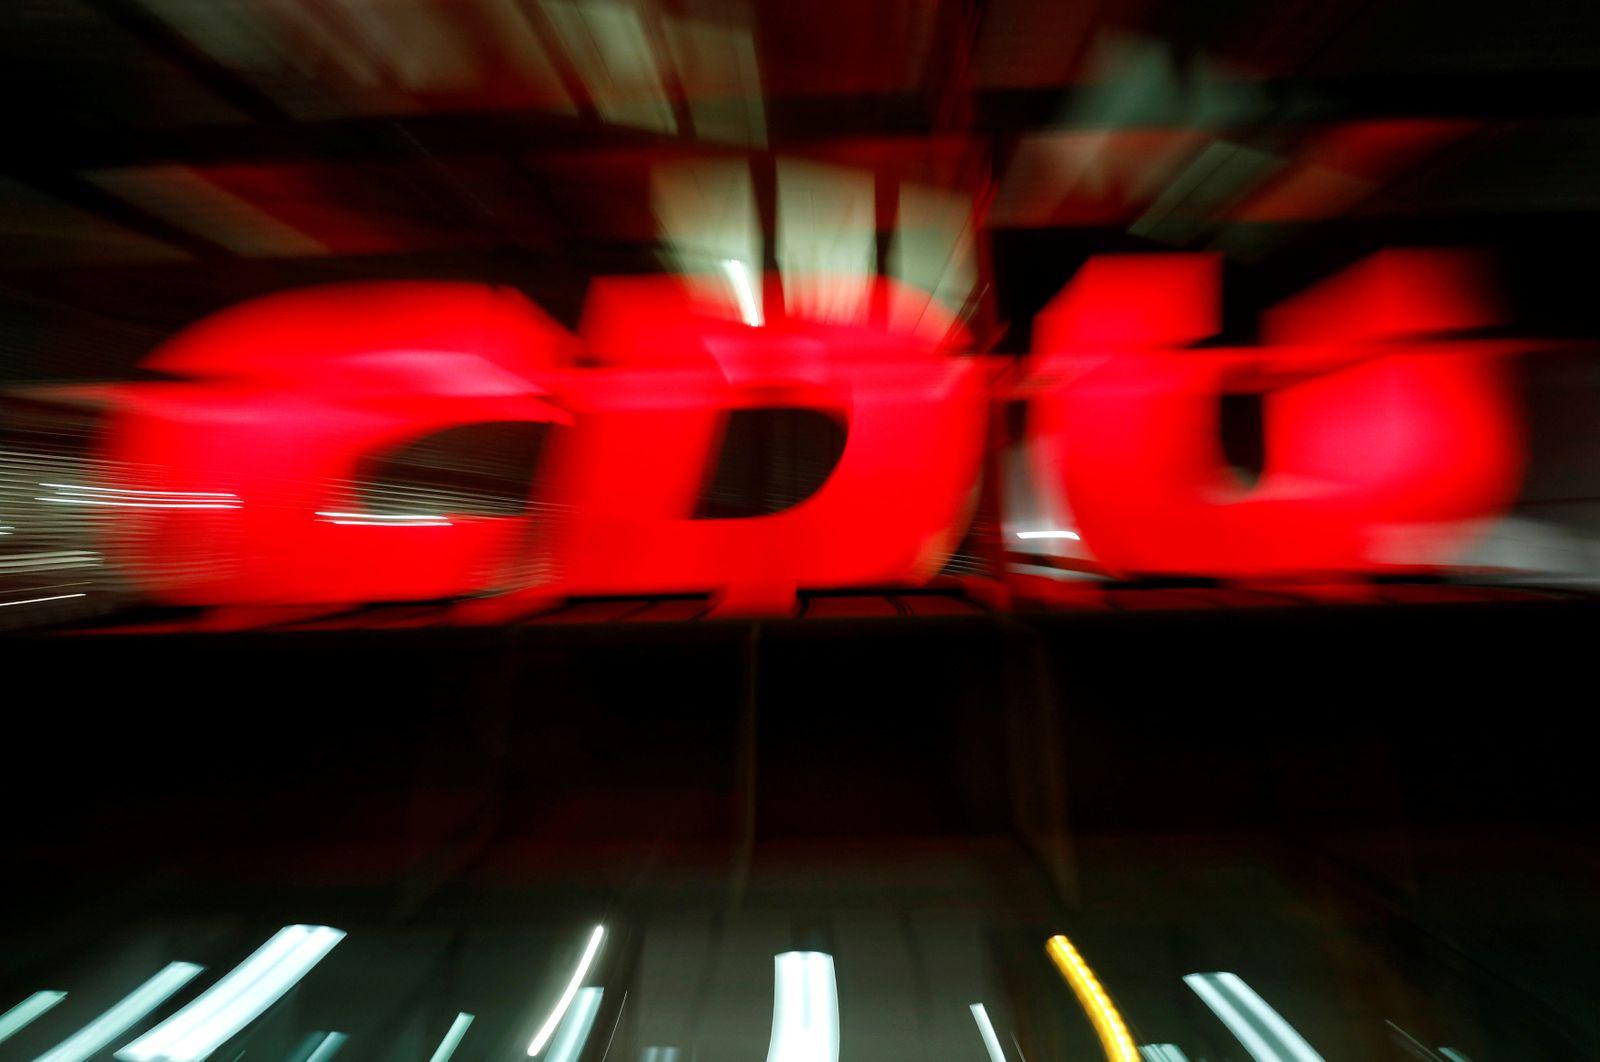 CDU board meeting